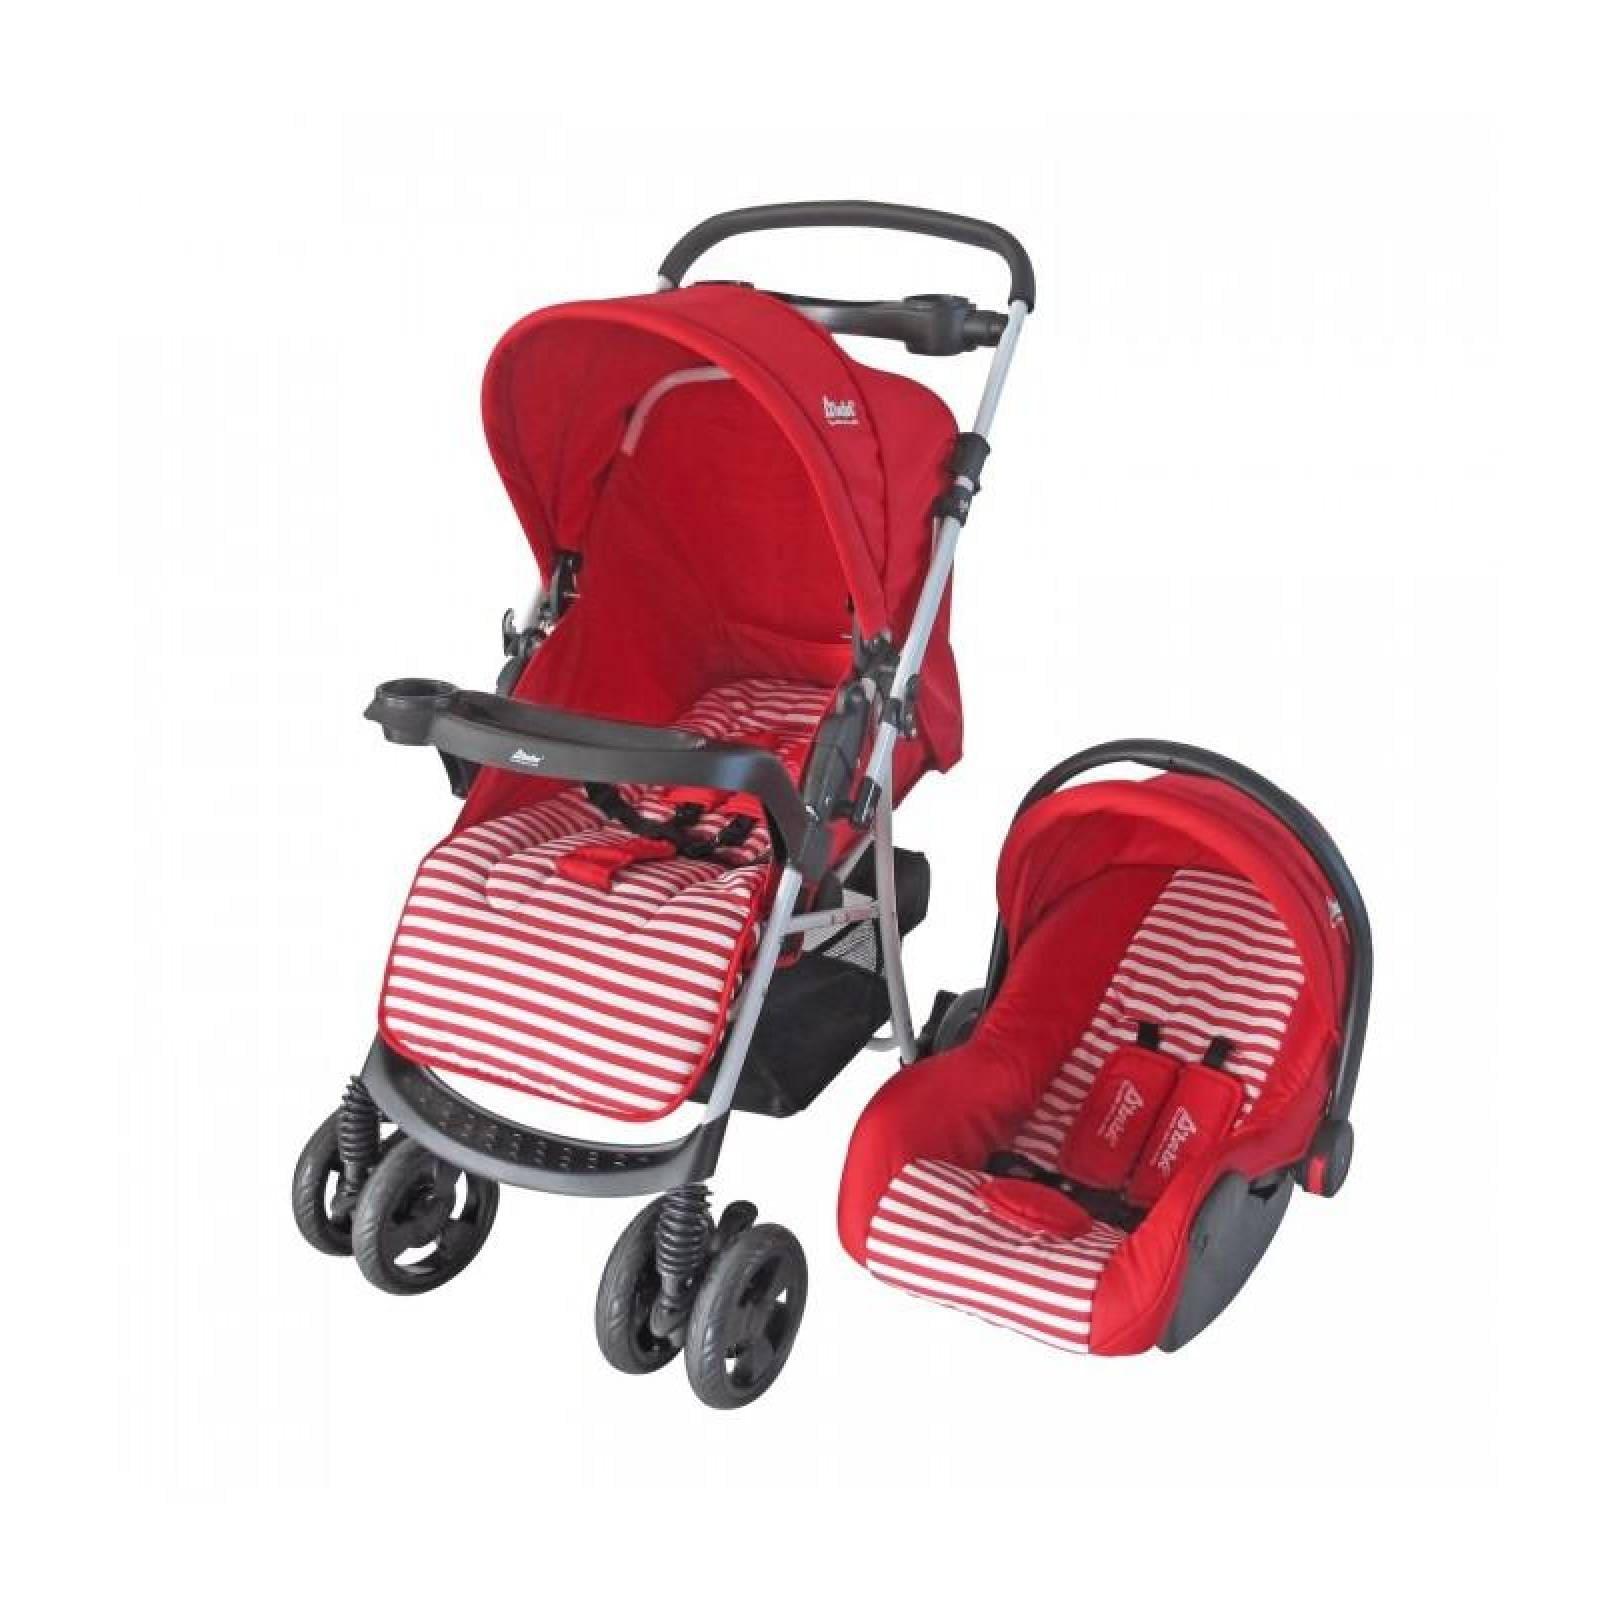 Carreolas con Portabebe Travel System Stripes Azul Rosa Rojo